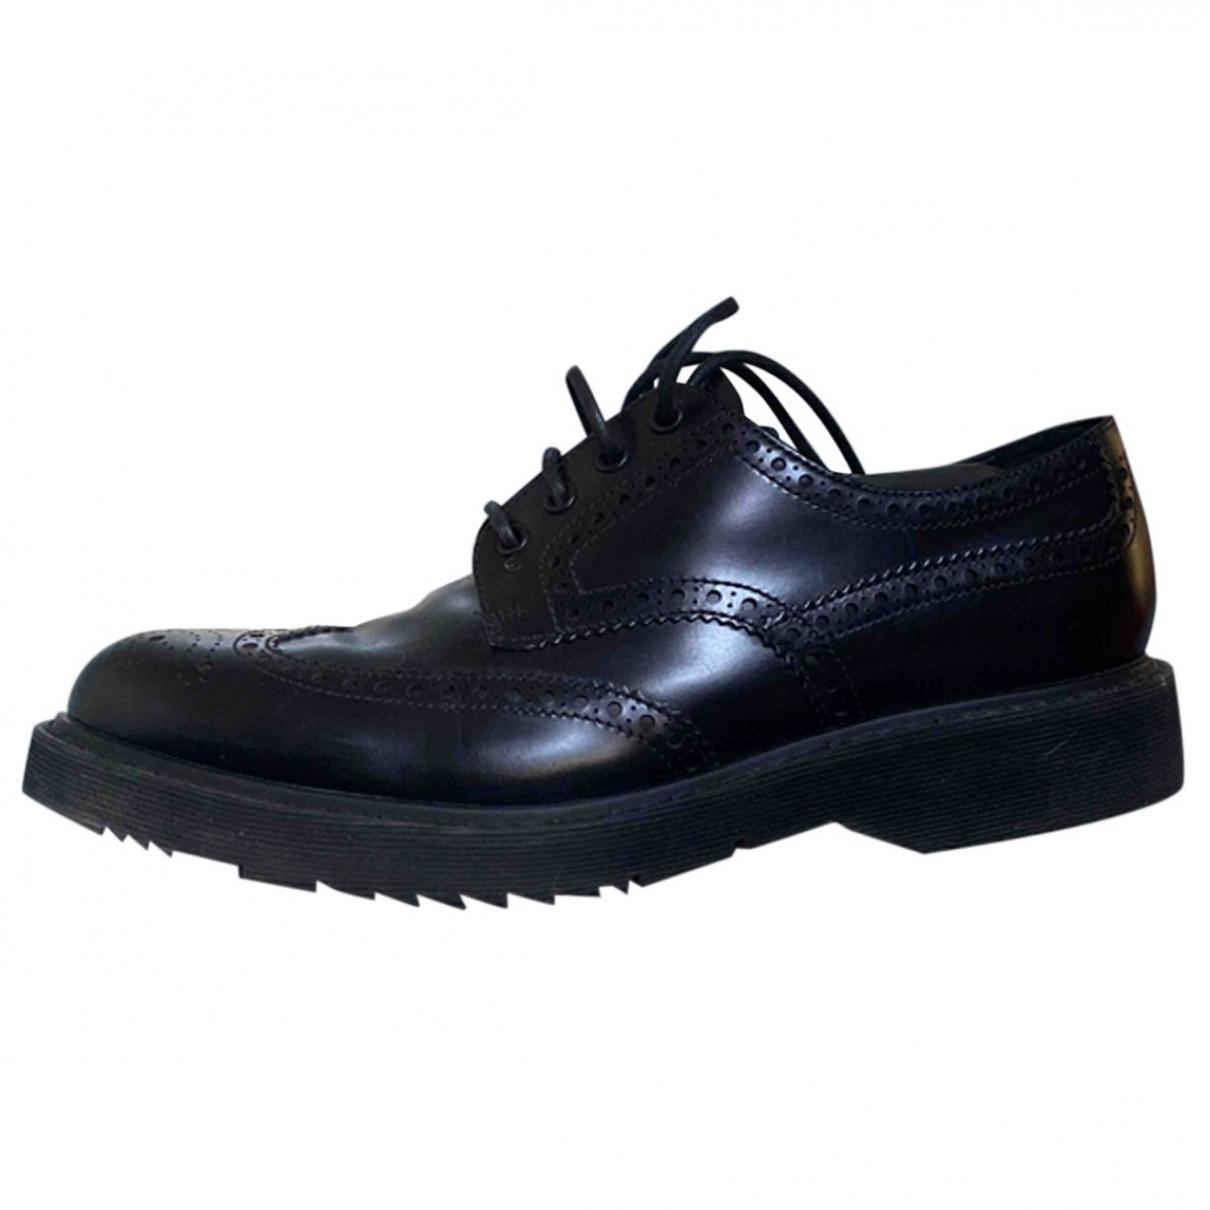 Prada \N Black Leather Lace ups for Men 42 EU